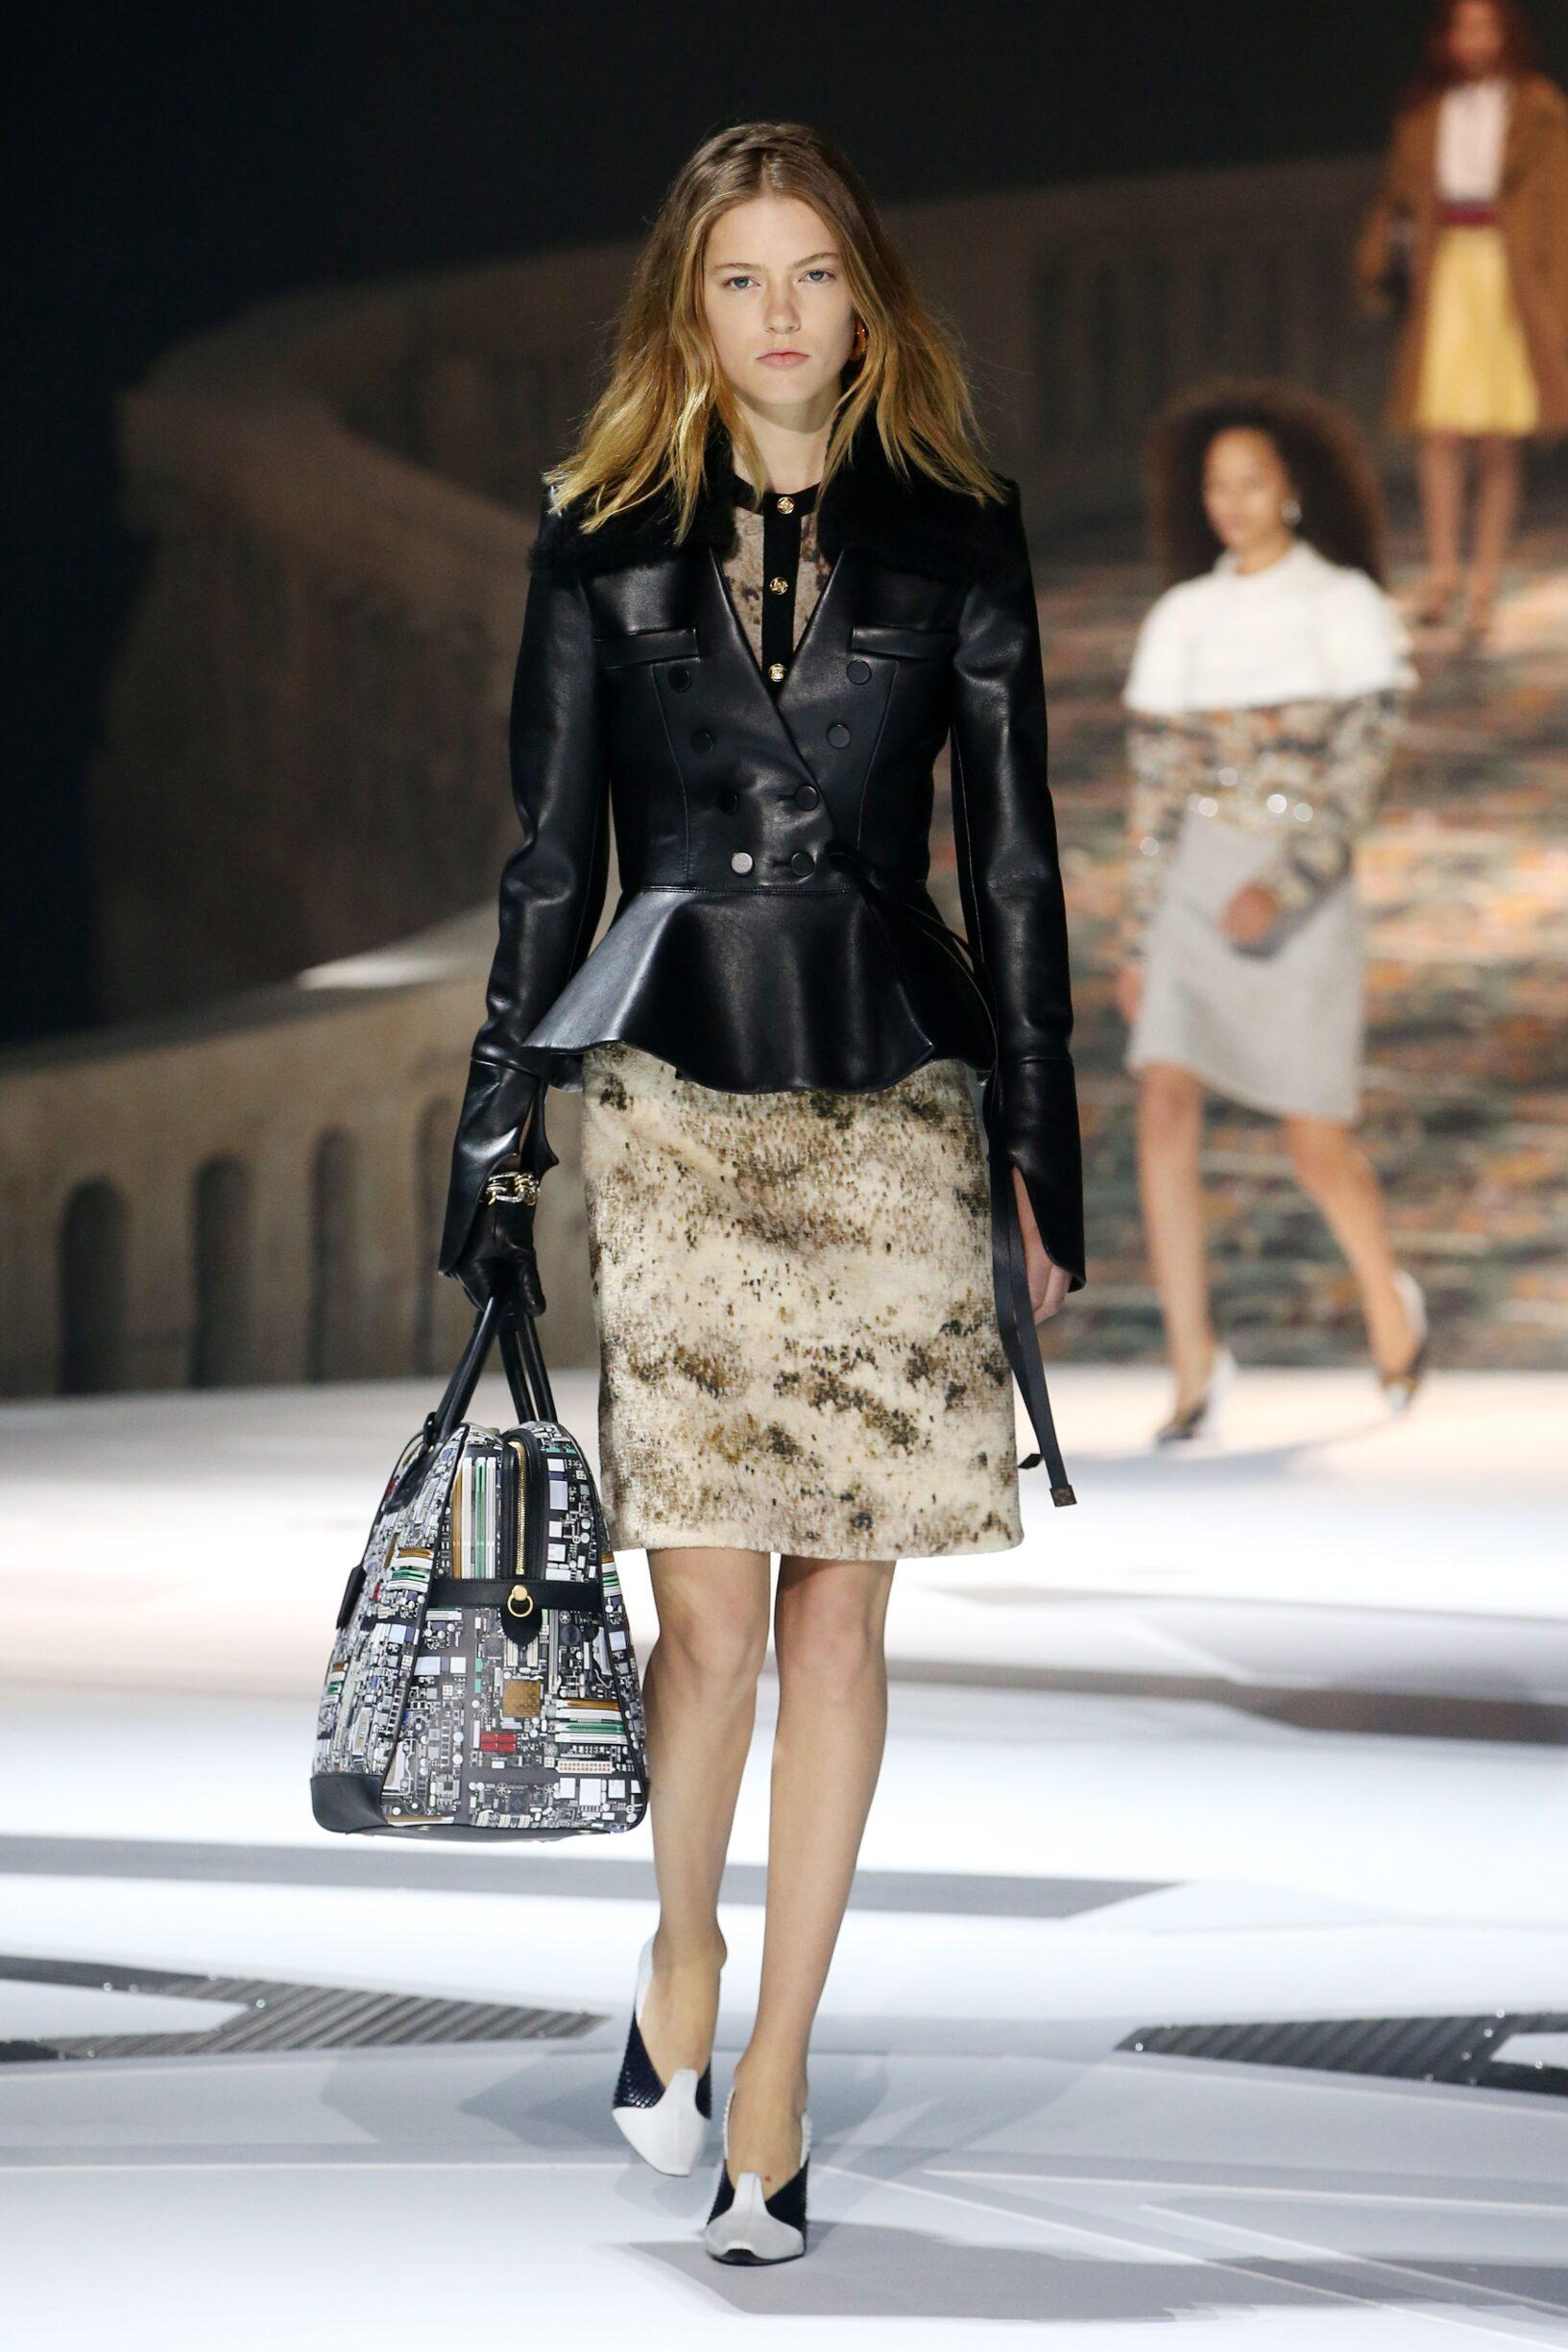 Louis Vuitton Paris Fashion Week Womenswear Trends